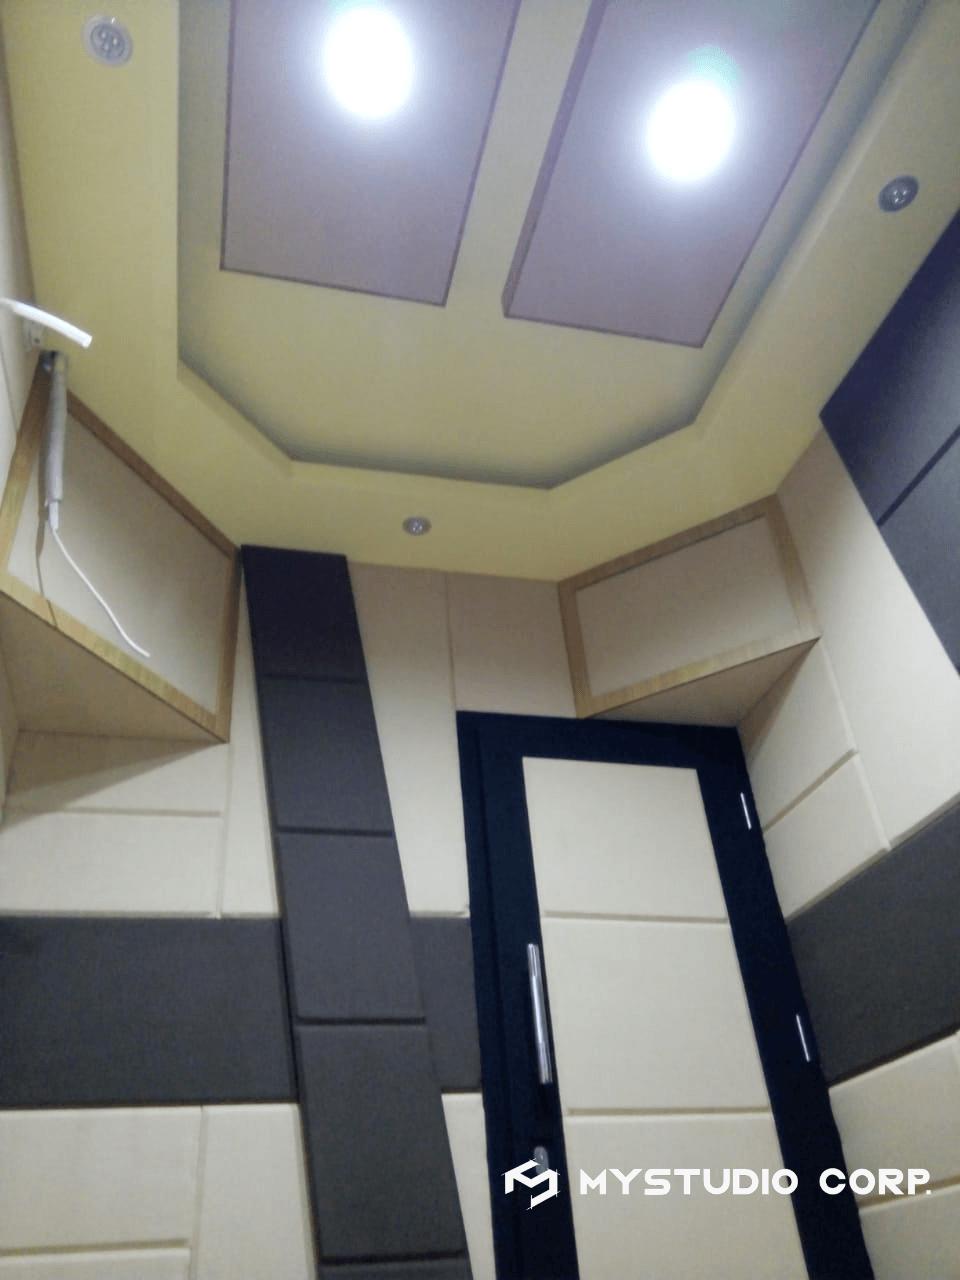 Mystudio.corp Studio Musik Cikarang Cikarang, Bekasi, Jawa Barat, Indonesia Cikarang, Bekasi, Jawa Barat, Indonesia Mystudiocorp-Studio-Musik-Cikarang  81513